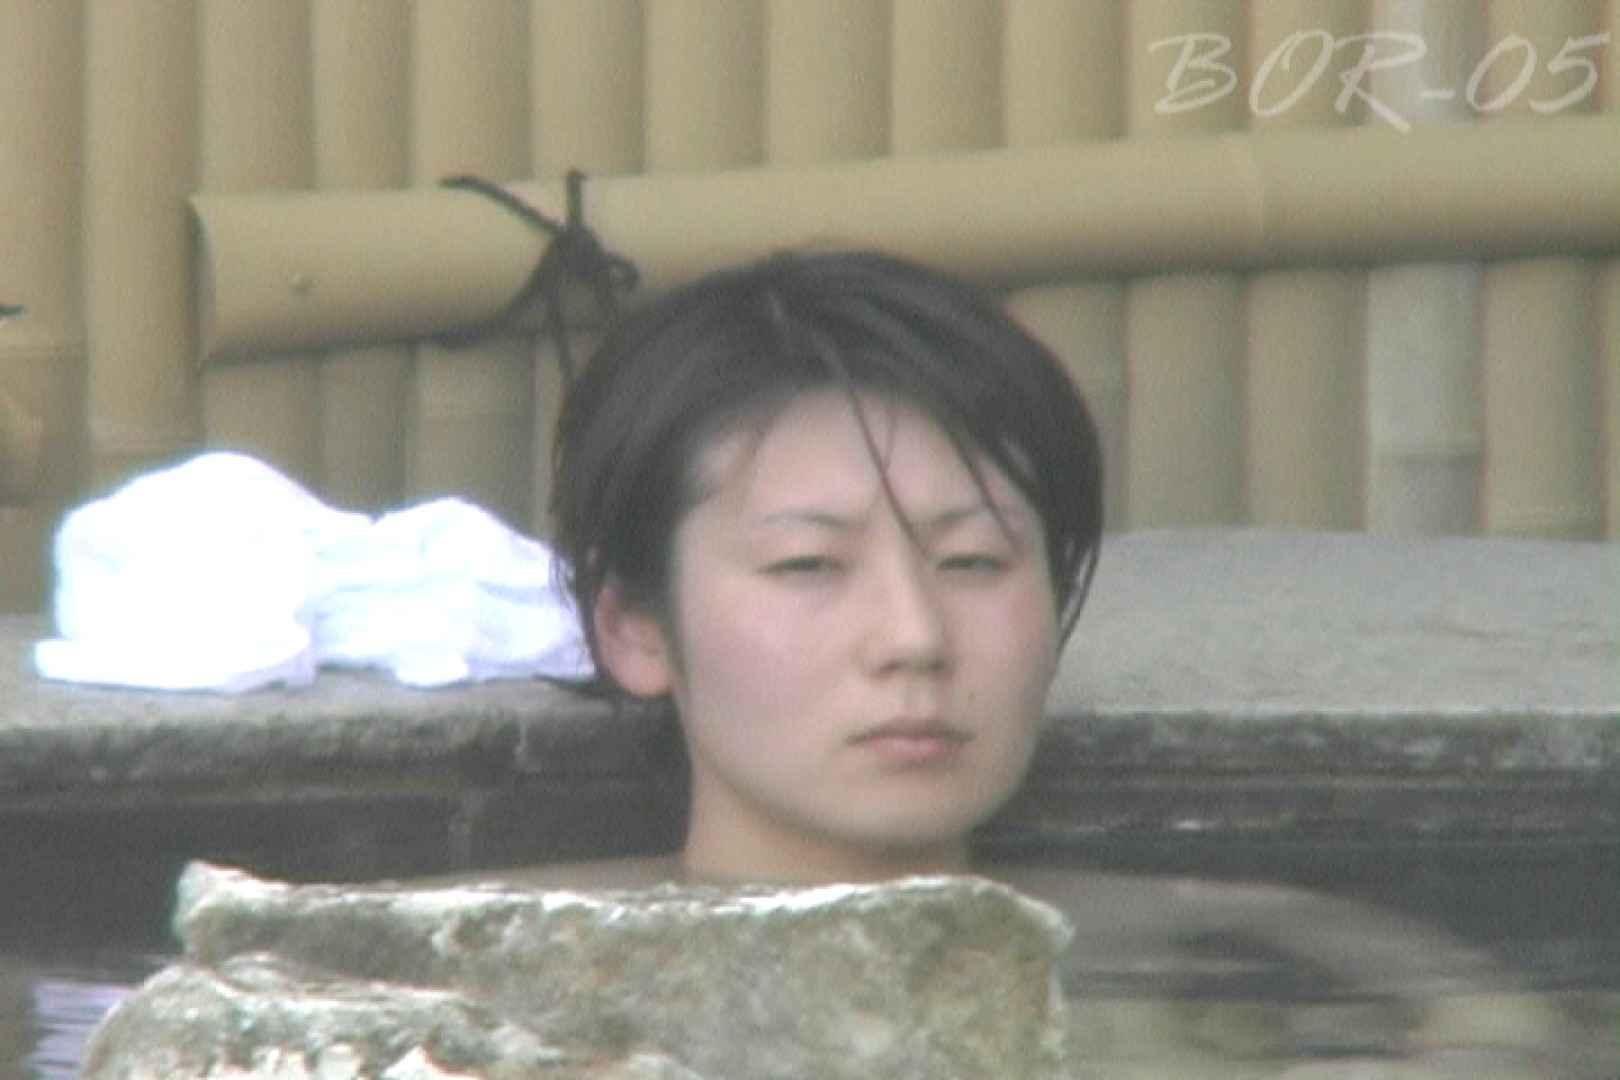 Aquaな露天風呂Vol.493 盗撮 AV無料動画キャプチャ 67PICs 29